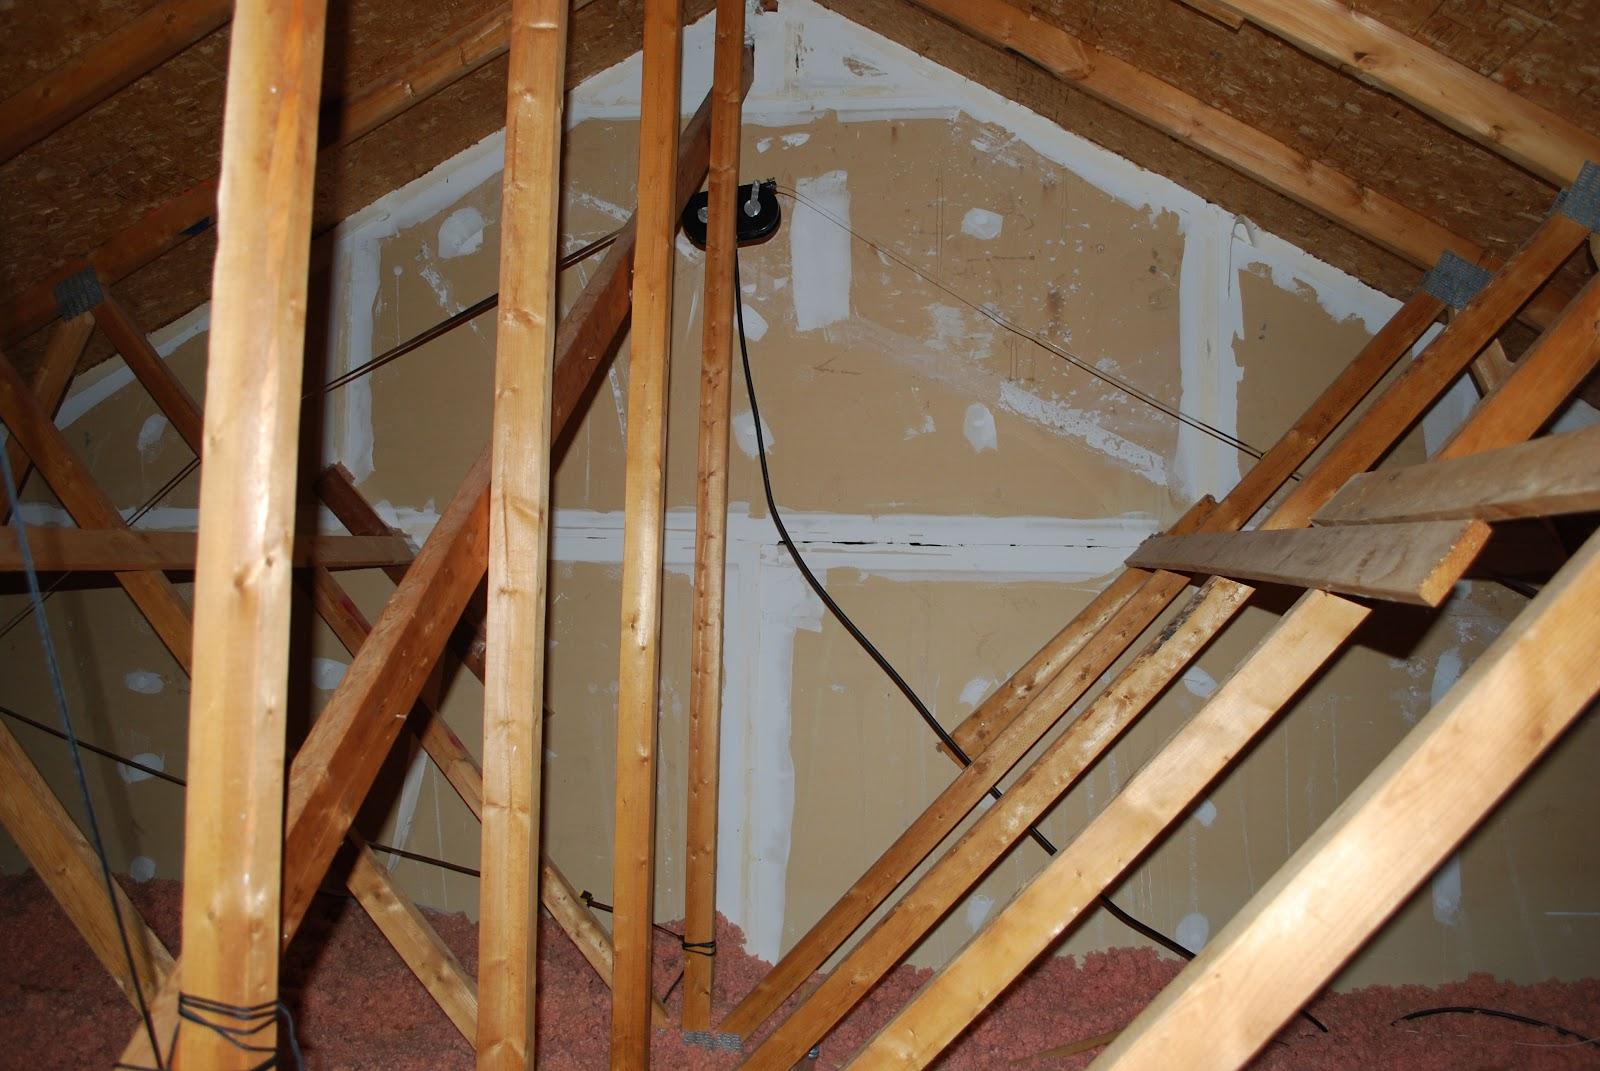 Hy-gain noise antenna & A trip into the attic. u2022 AmateurRadio.com